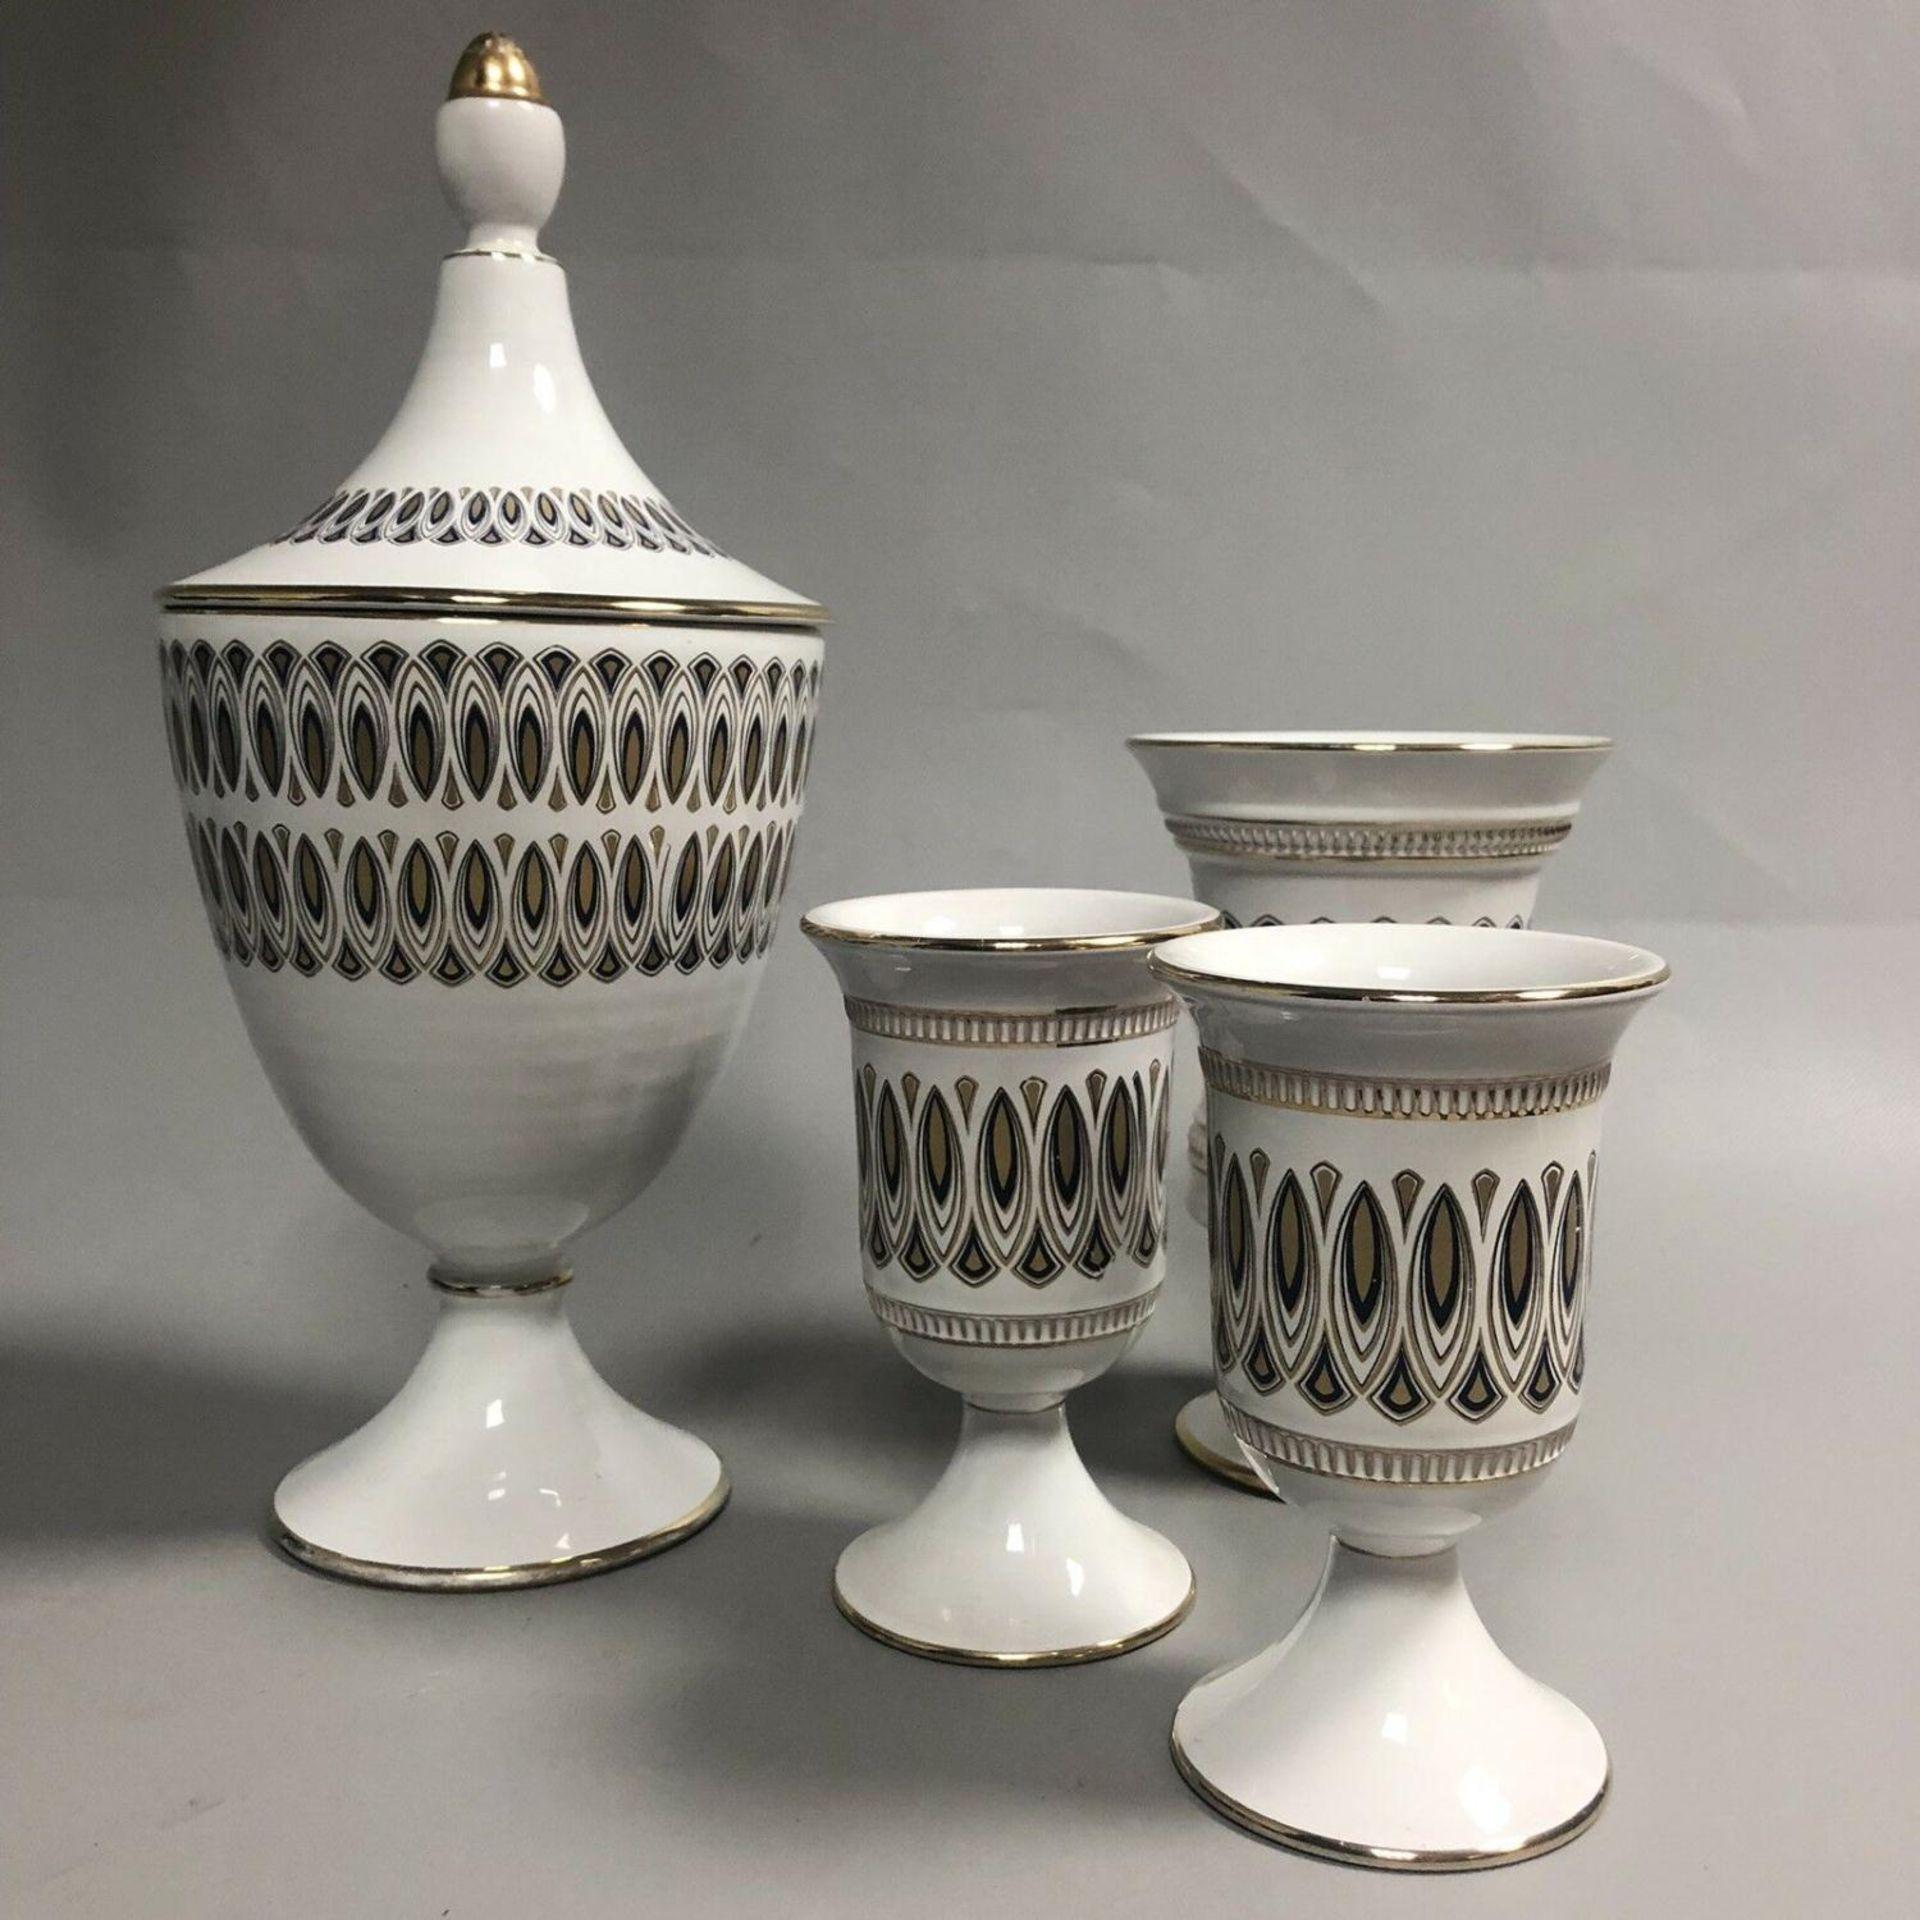 Lot 36 - A group of mid century retro Italian ceramics by Il Verrocchio, Florence - Vases